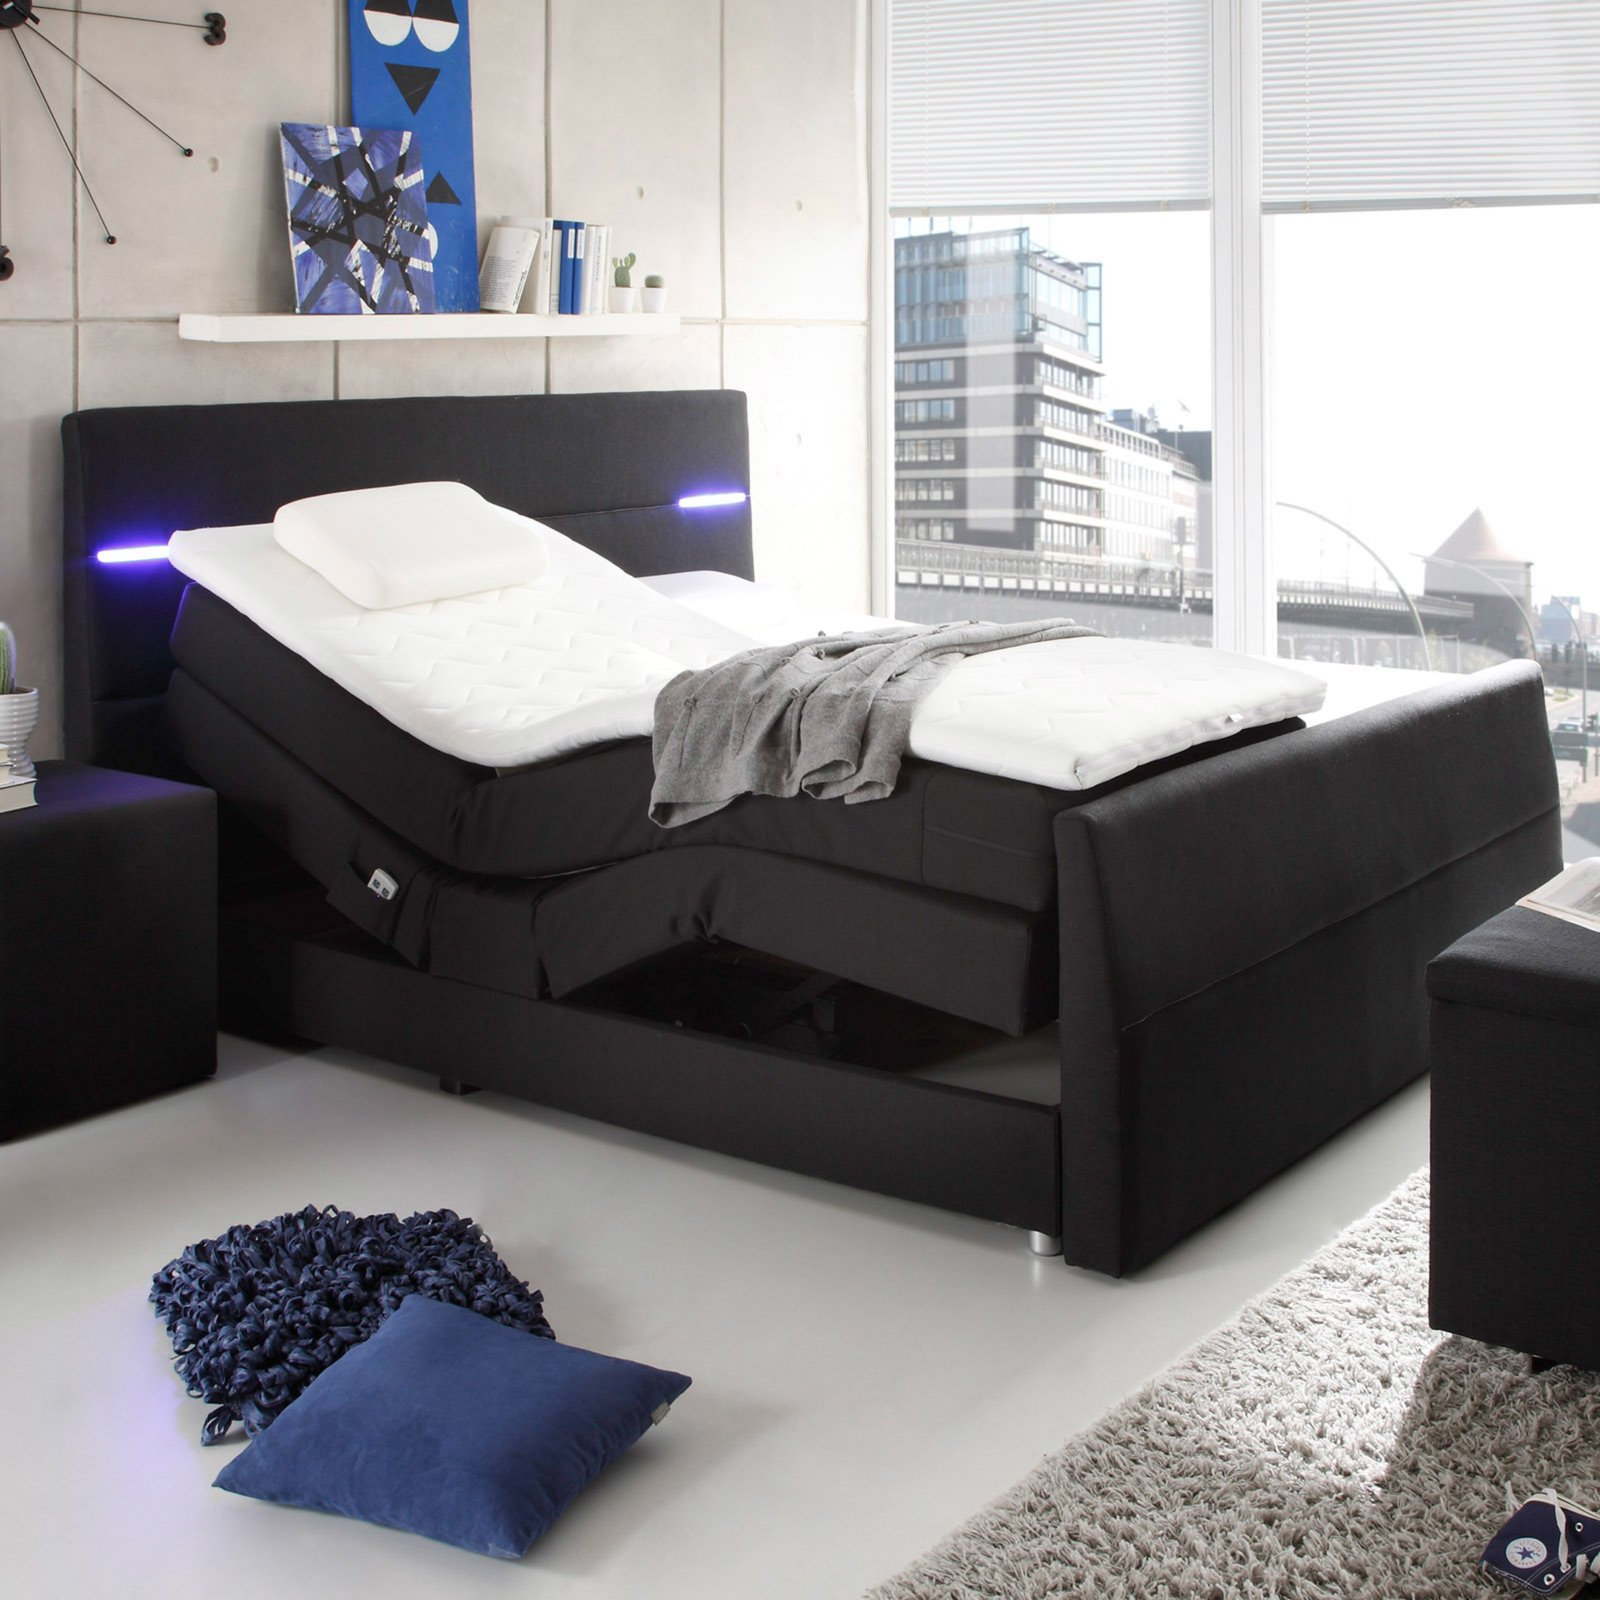 Boxspringbett NEBRASKA  schwarz  180x200 cm  eBay